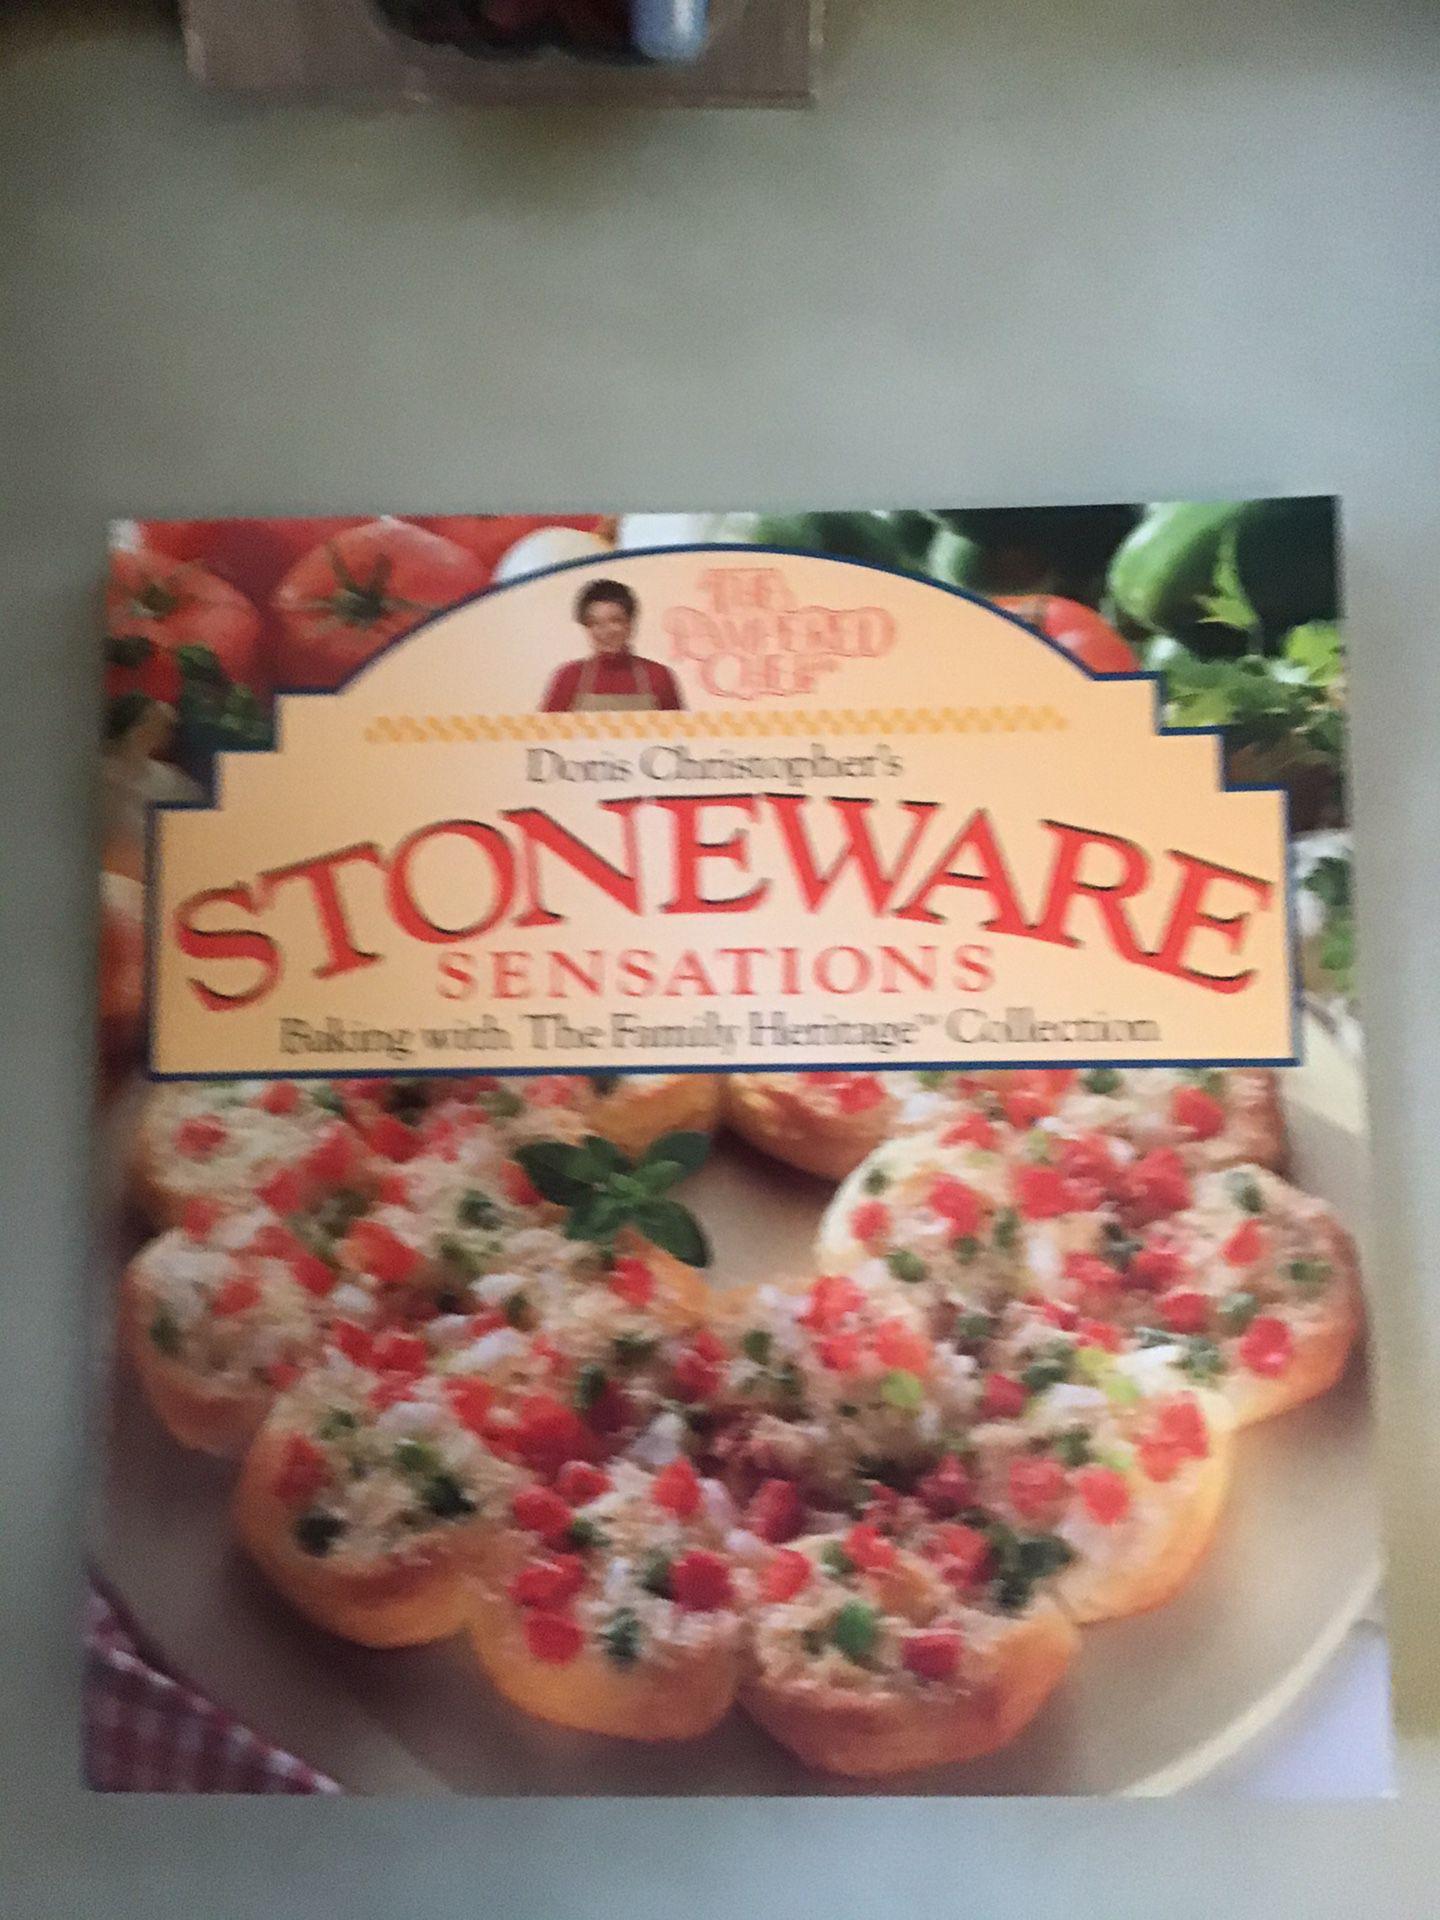 Book, Pampered Chef Stoneware Sensations